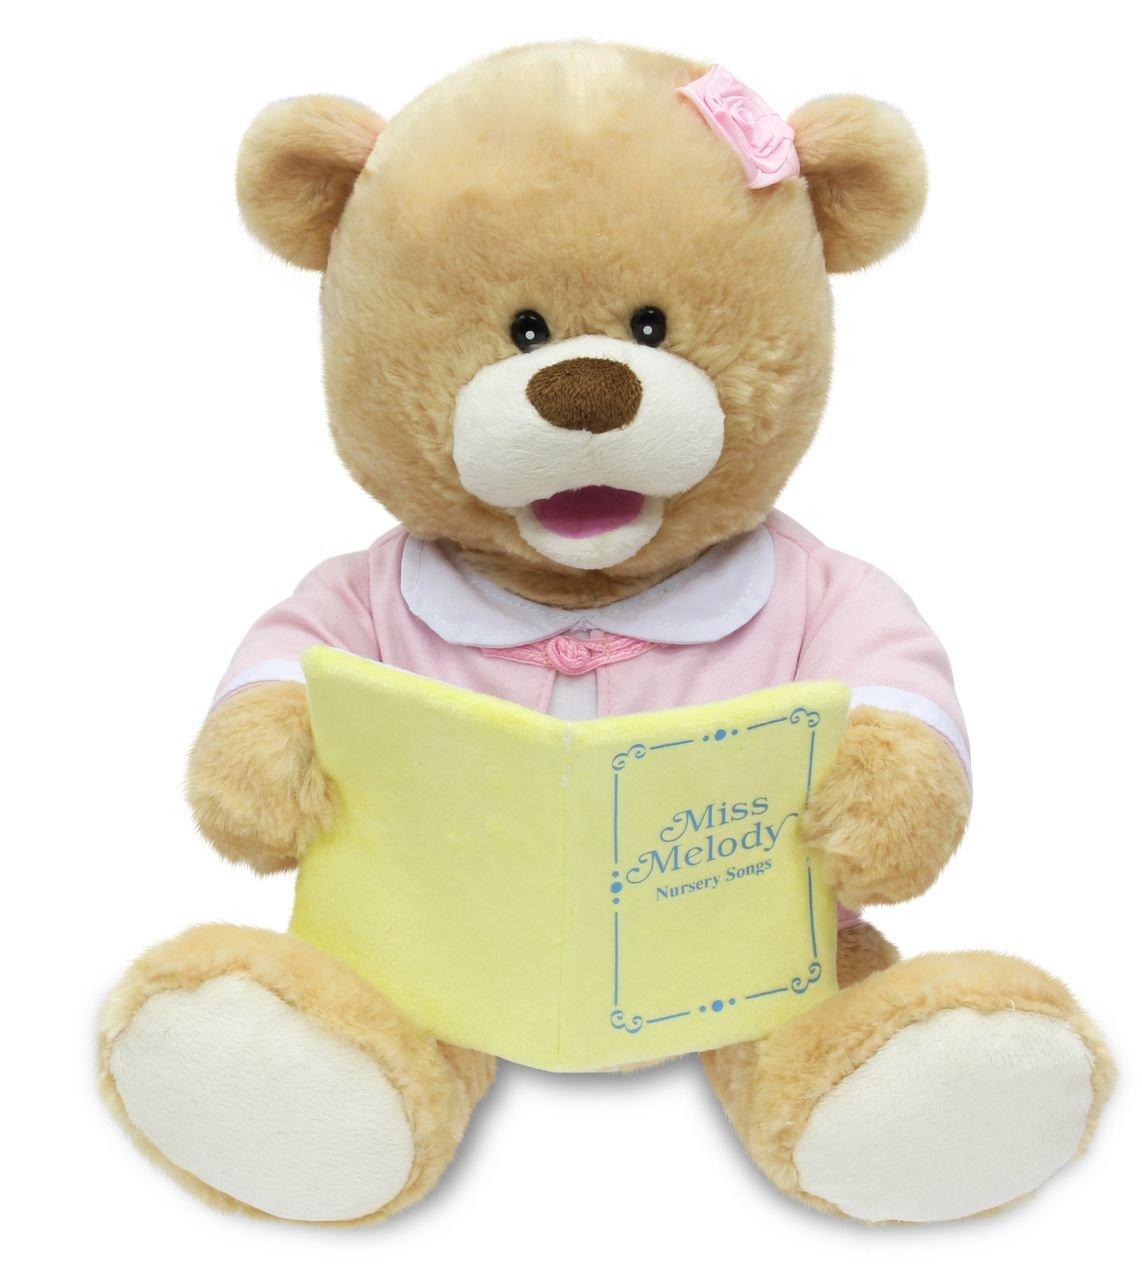 amazon com cuddle barn new animated singing teddy bear plush toy